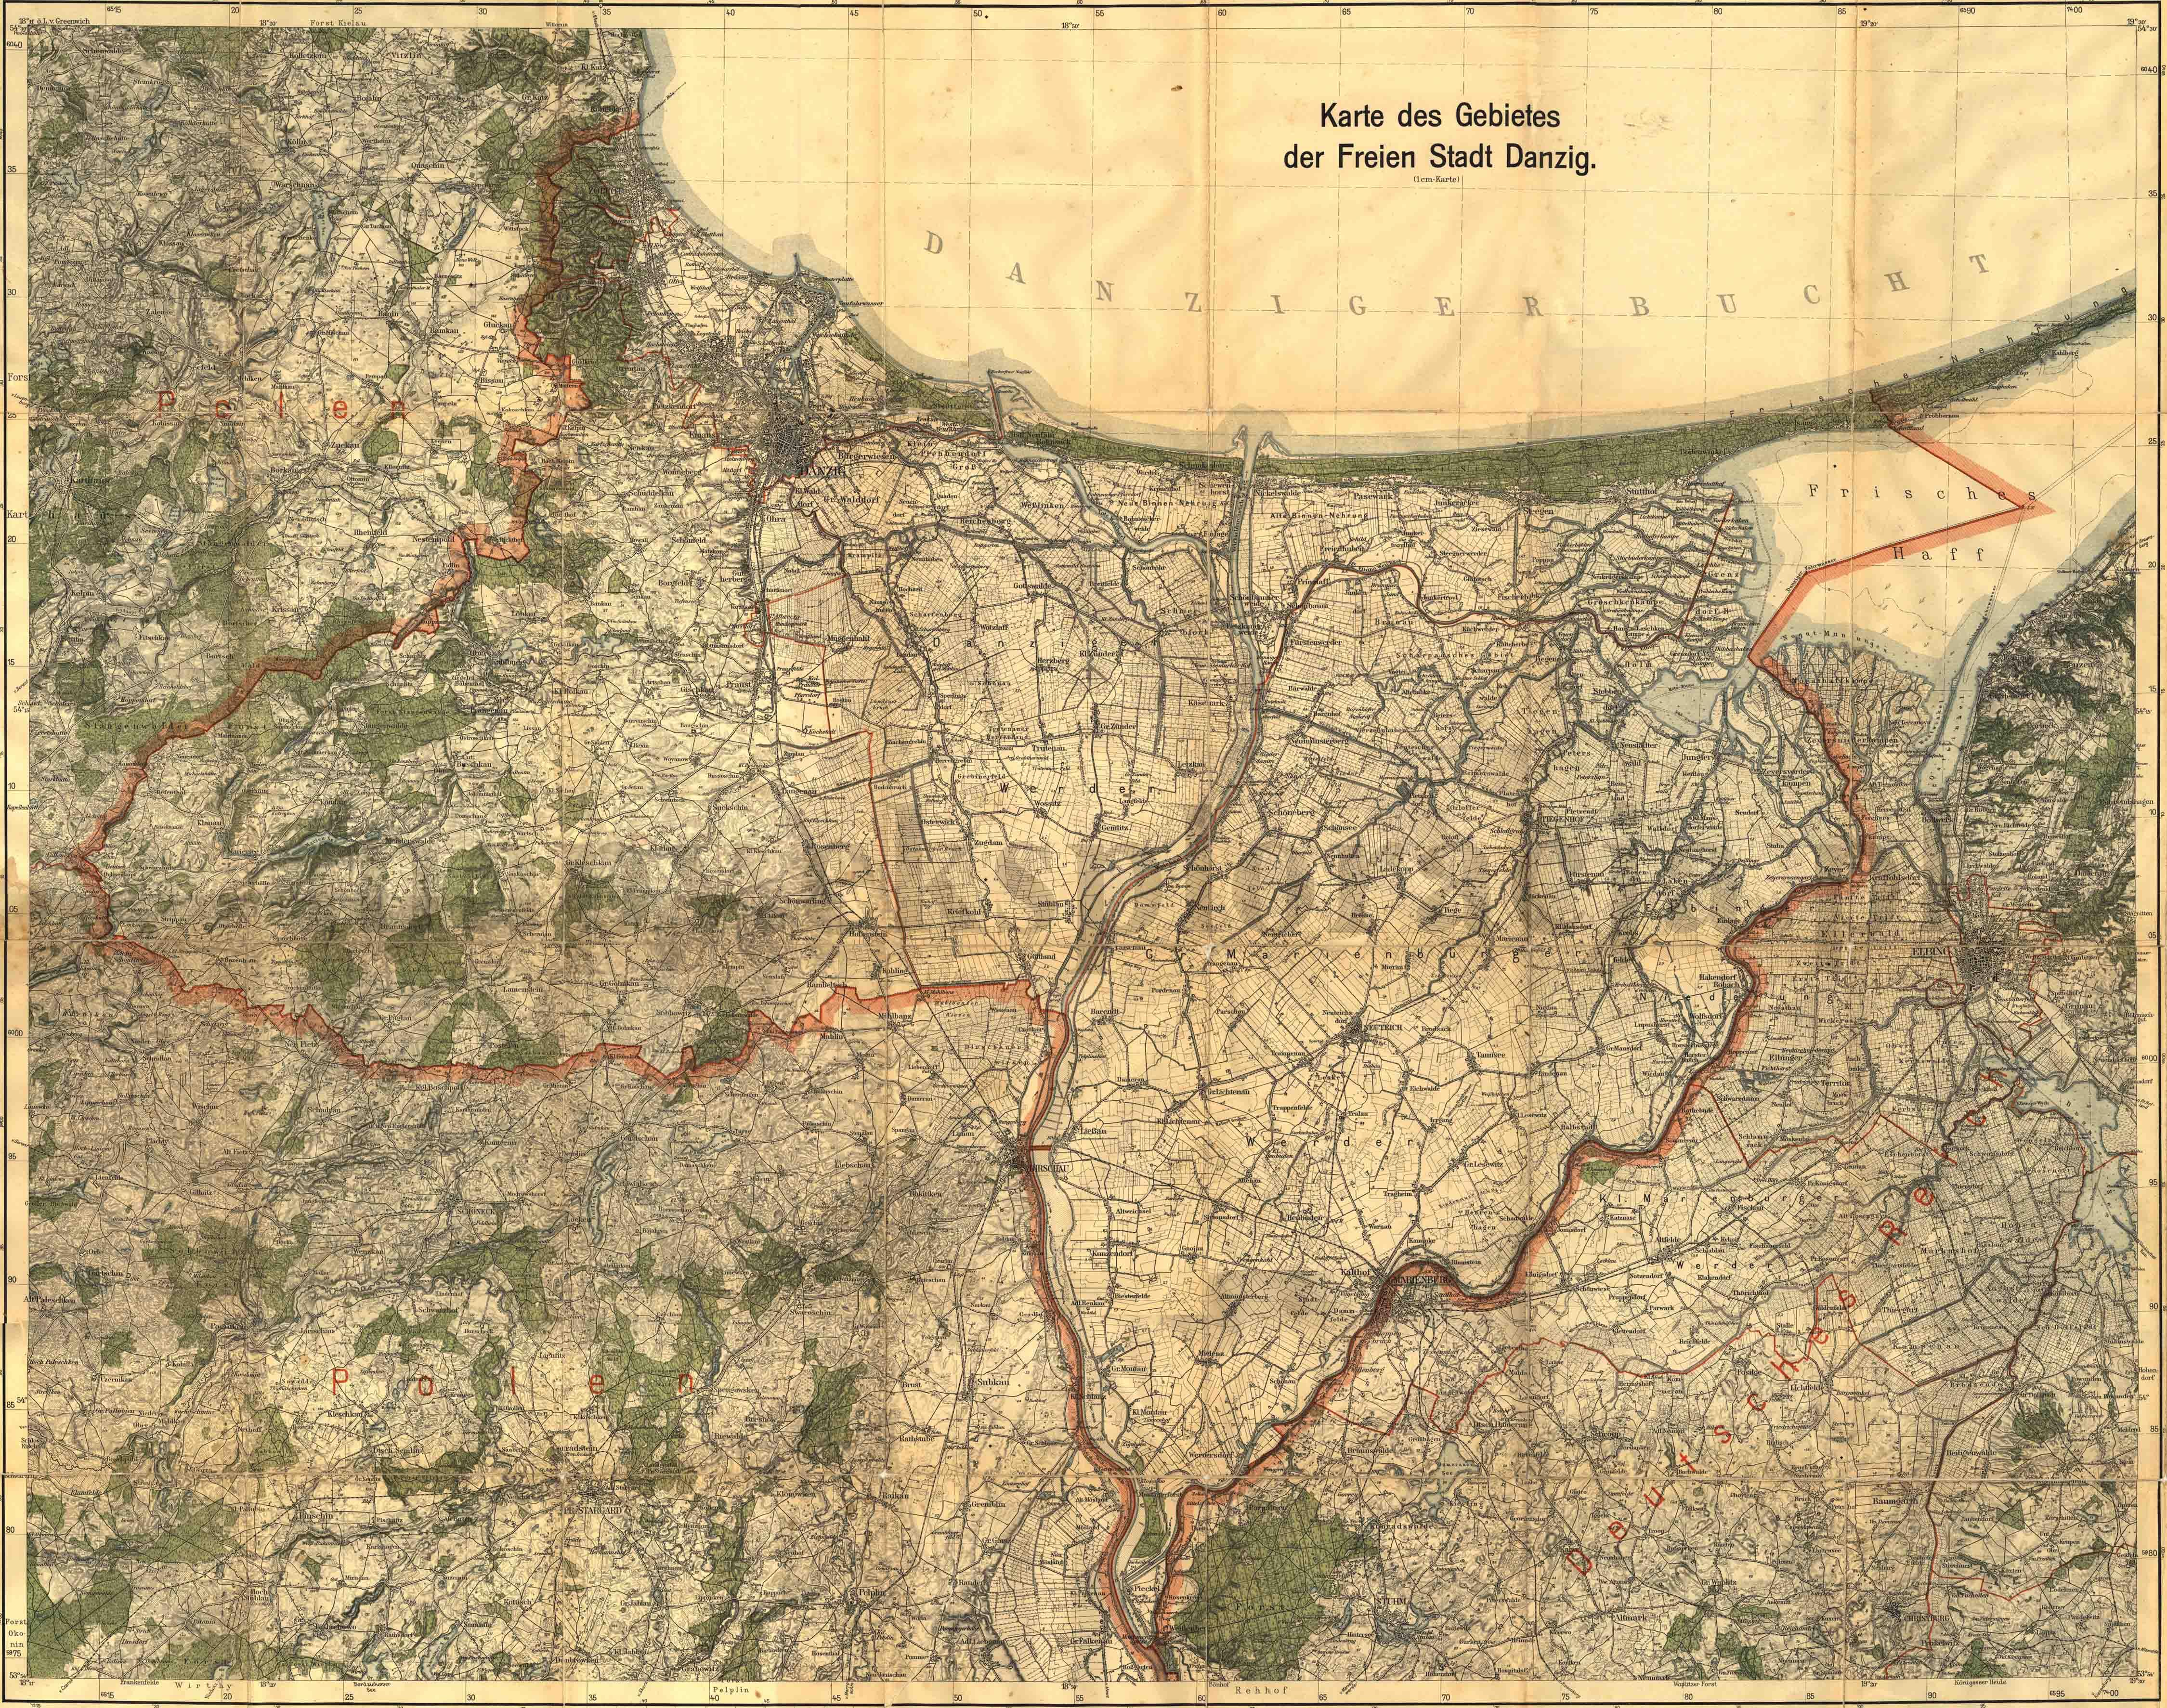 Karte_des_Gebiets_der_Freinstadt_Danzig_100k_1930_AMPG_2.jpg